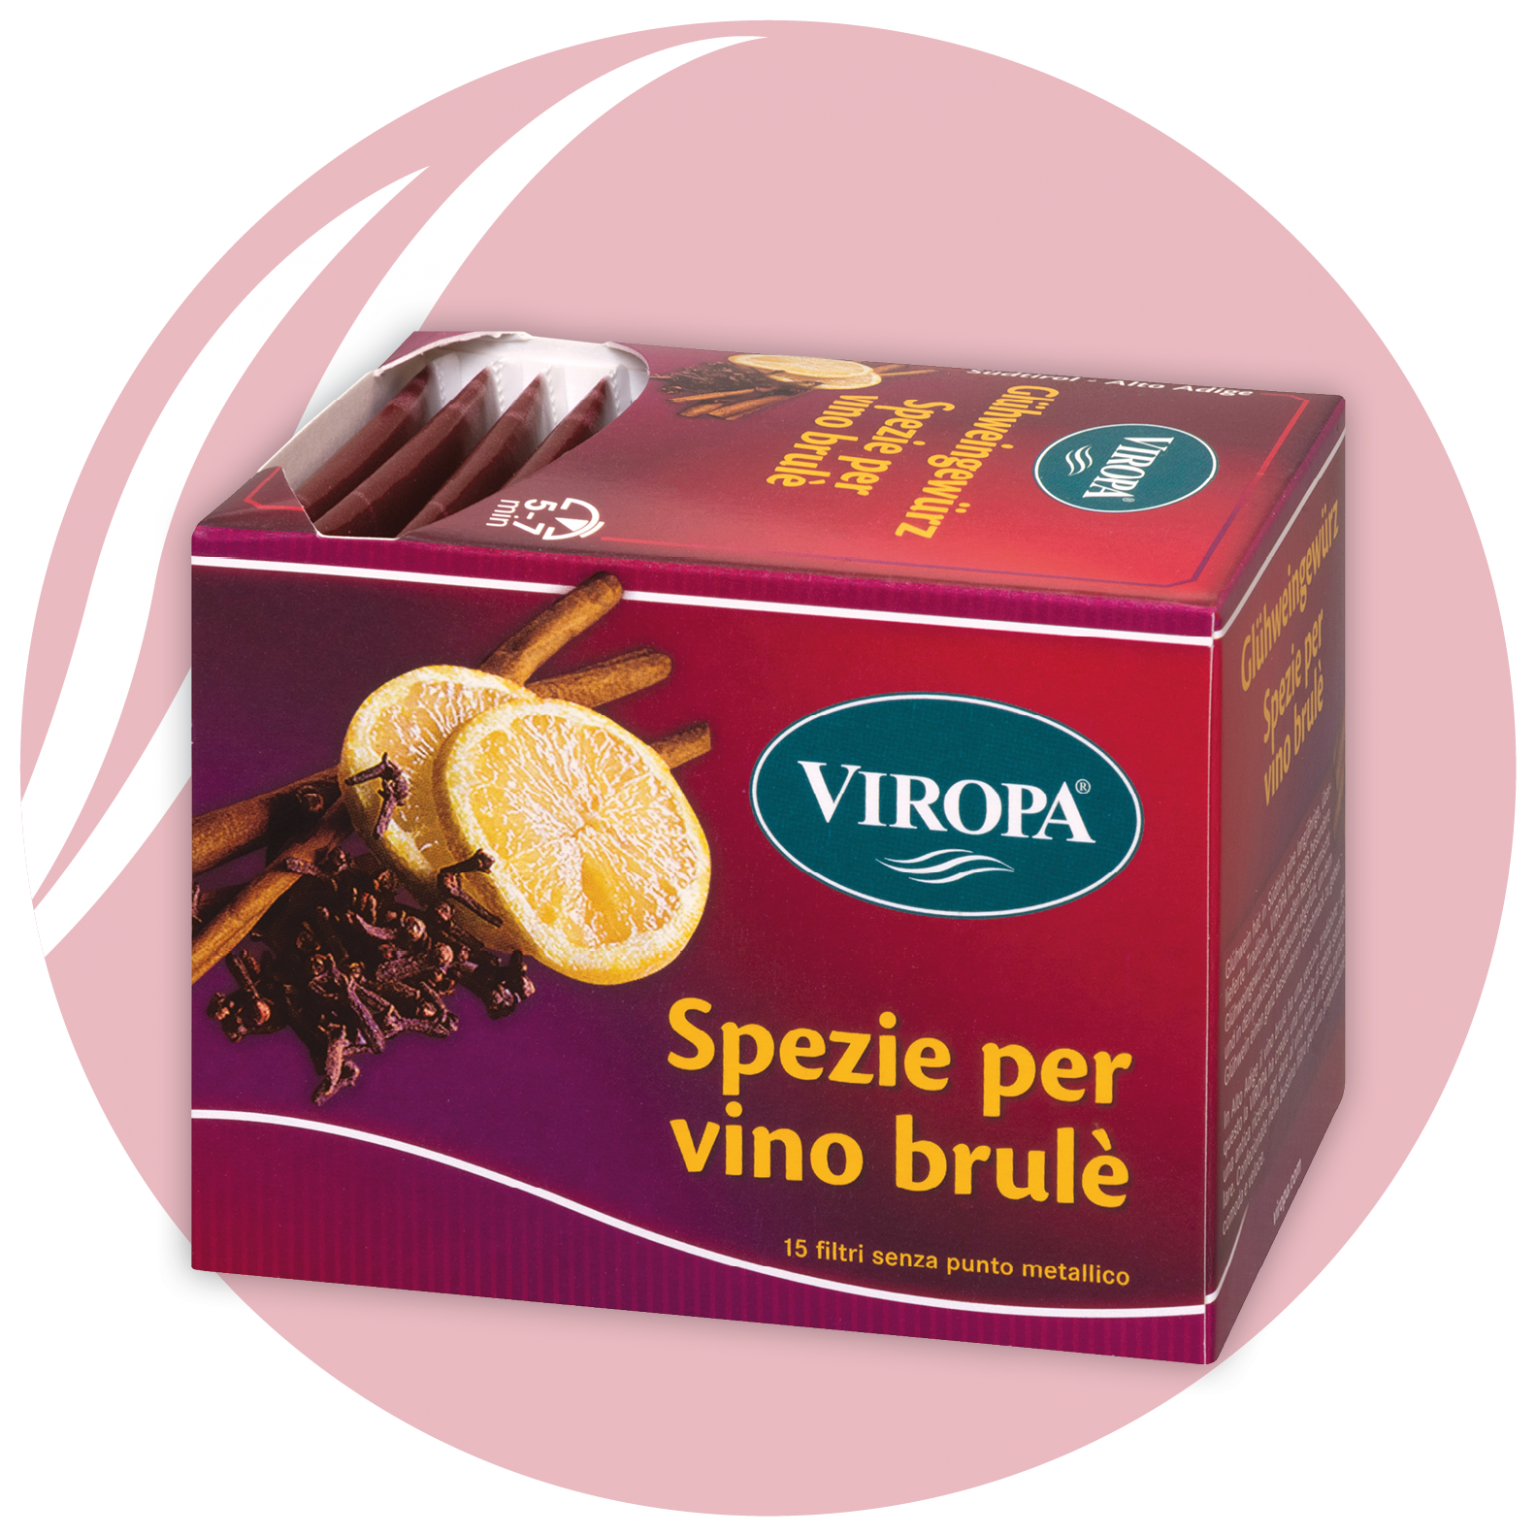 viropa spezie vino brule